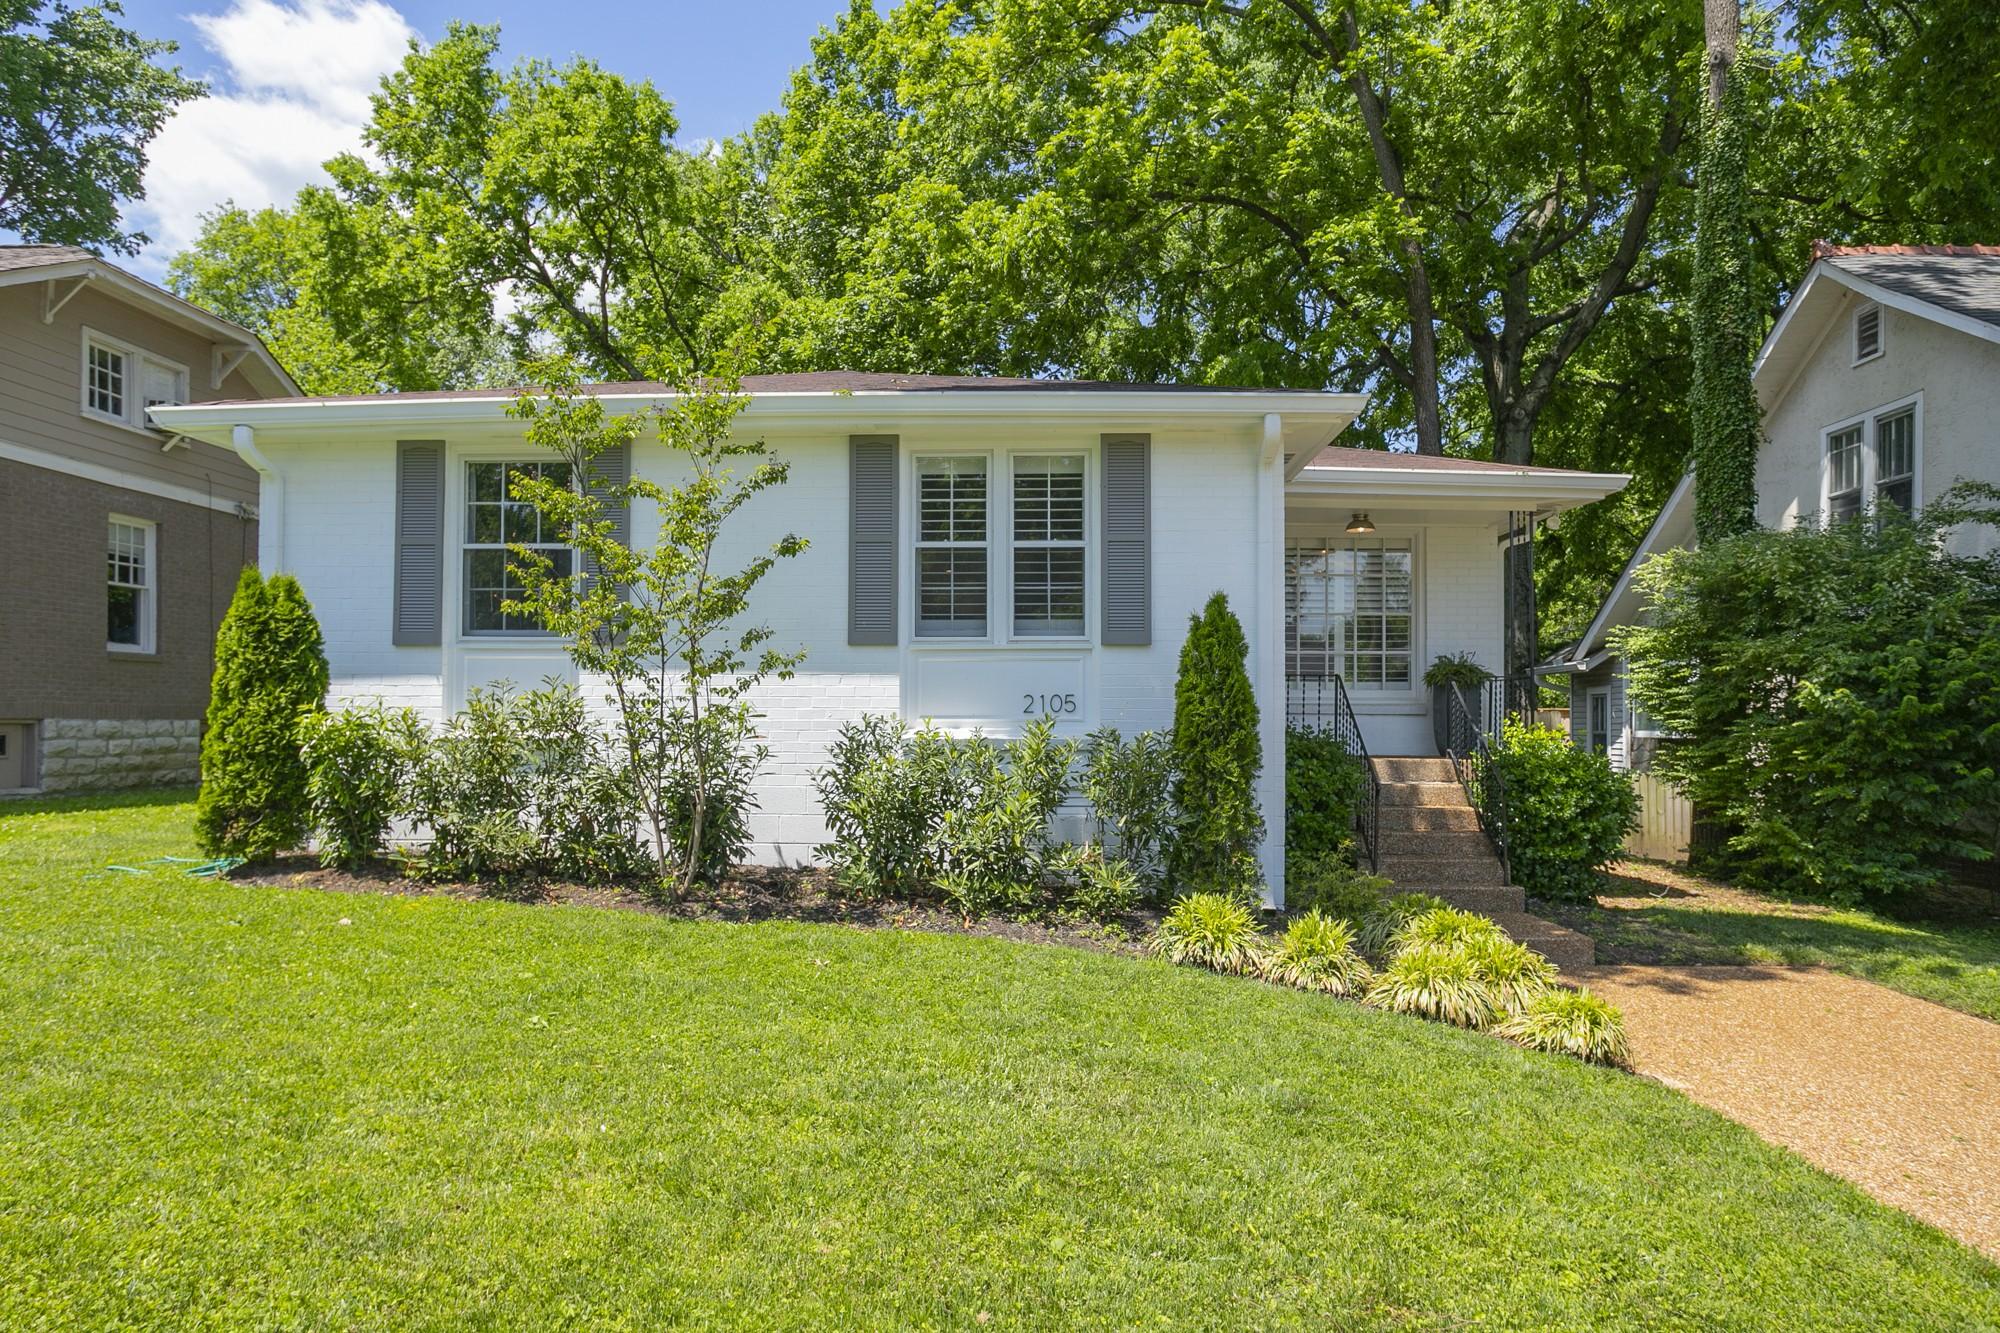 2105 18th Ave S Property Photo - Nashville, TN real estate listing